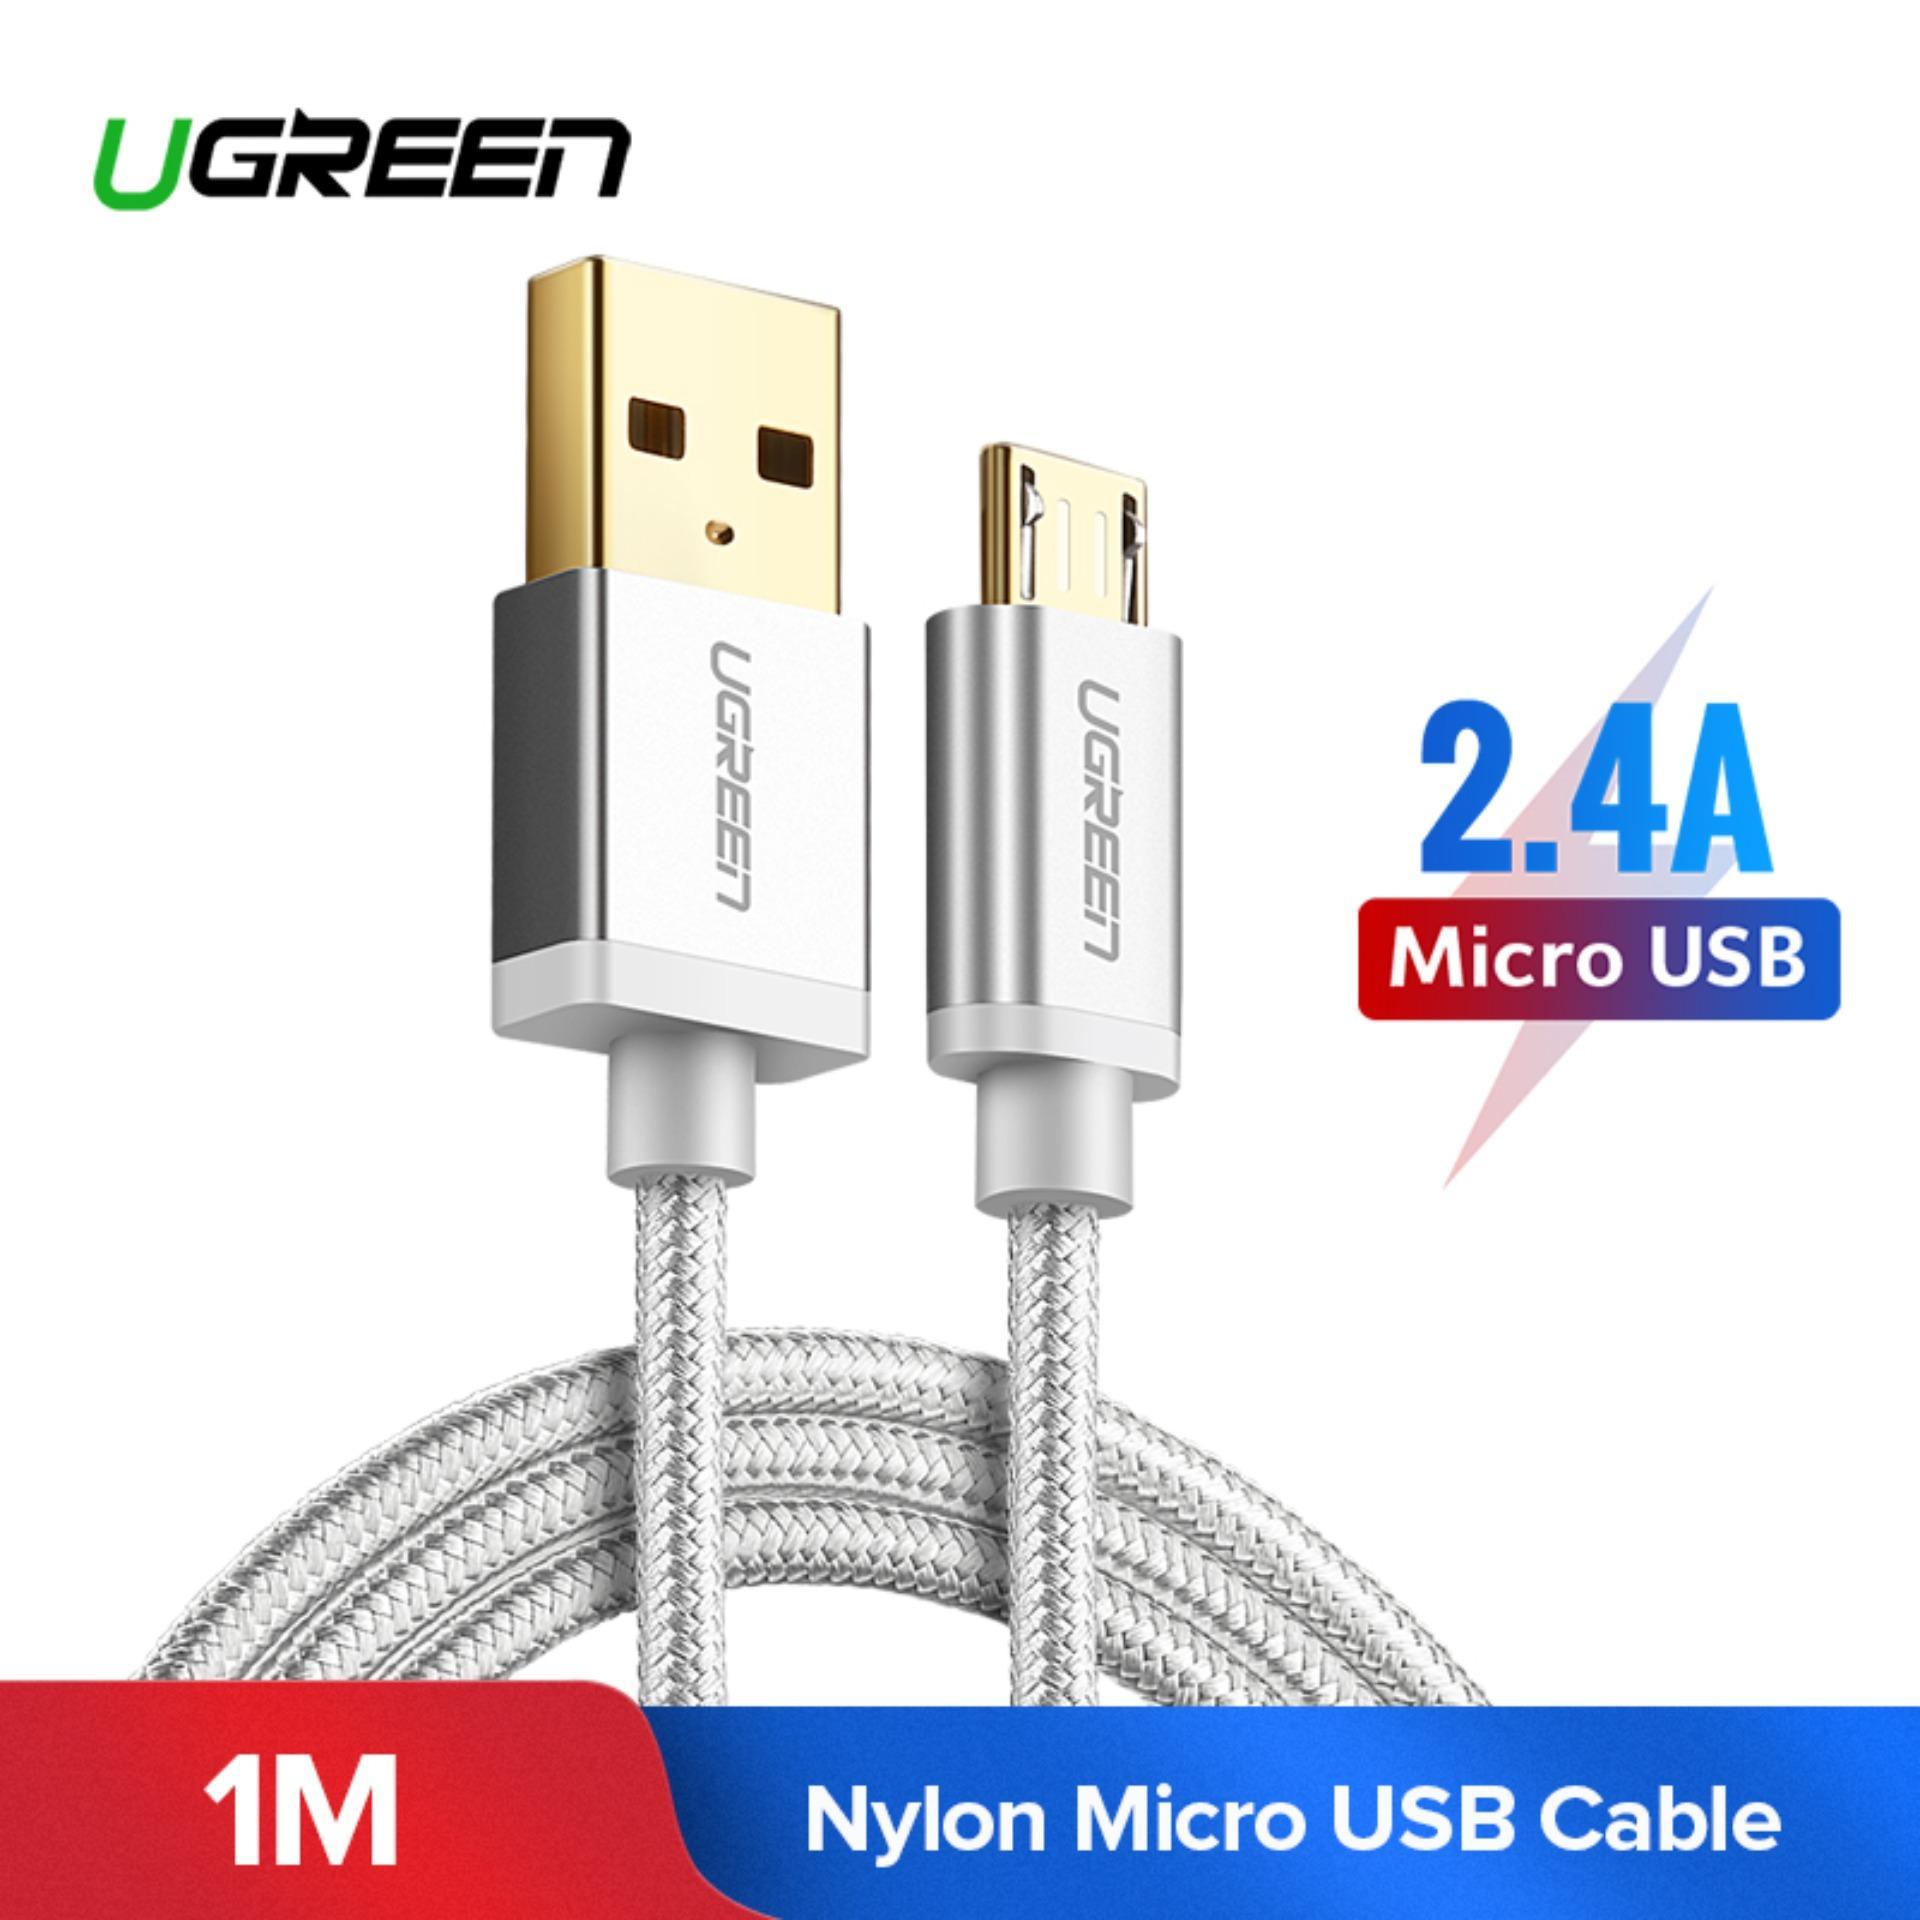 UGREEN 1M Kabel Data Micro USB for Xiaomi Redmi 5 Plus, Xiaomi Redmi 5, XIAOMI Redmi S2, XIAOMI Mi A2 Lite, XIAOMI Redmi 5A, Samsung J7, Vivo y83, Vivo v9, OPPO A77, Huawei nova 2i, Handphone Charger Cable Sync Data Charging Cable